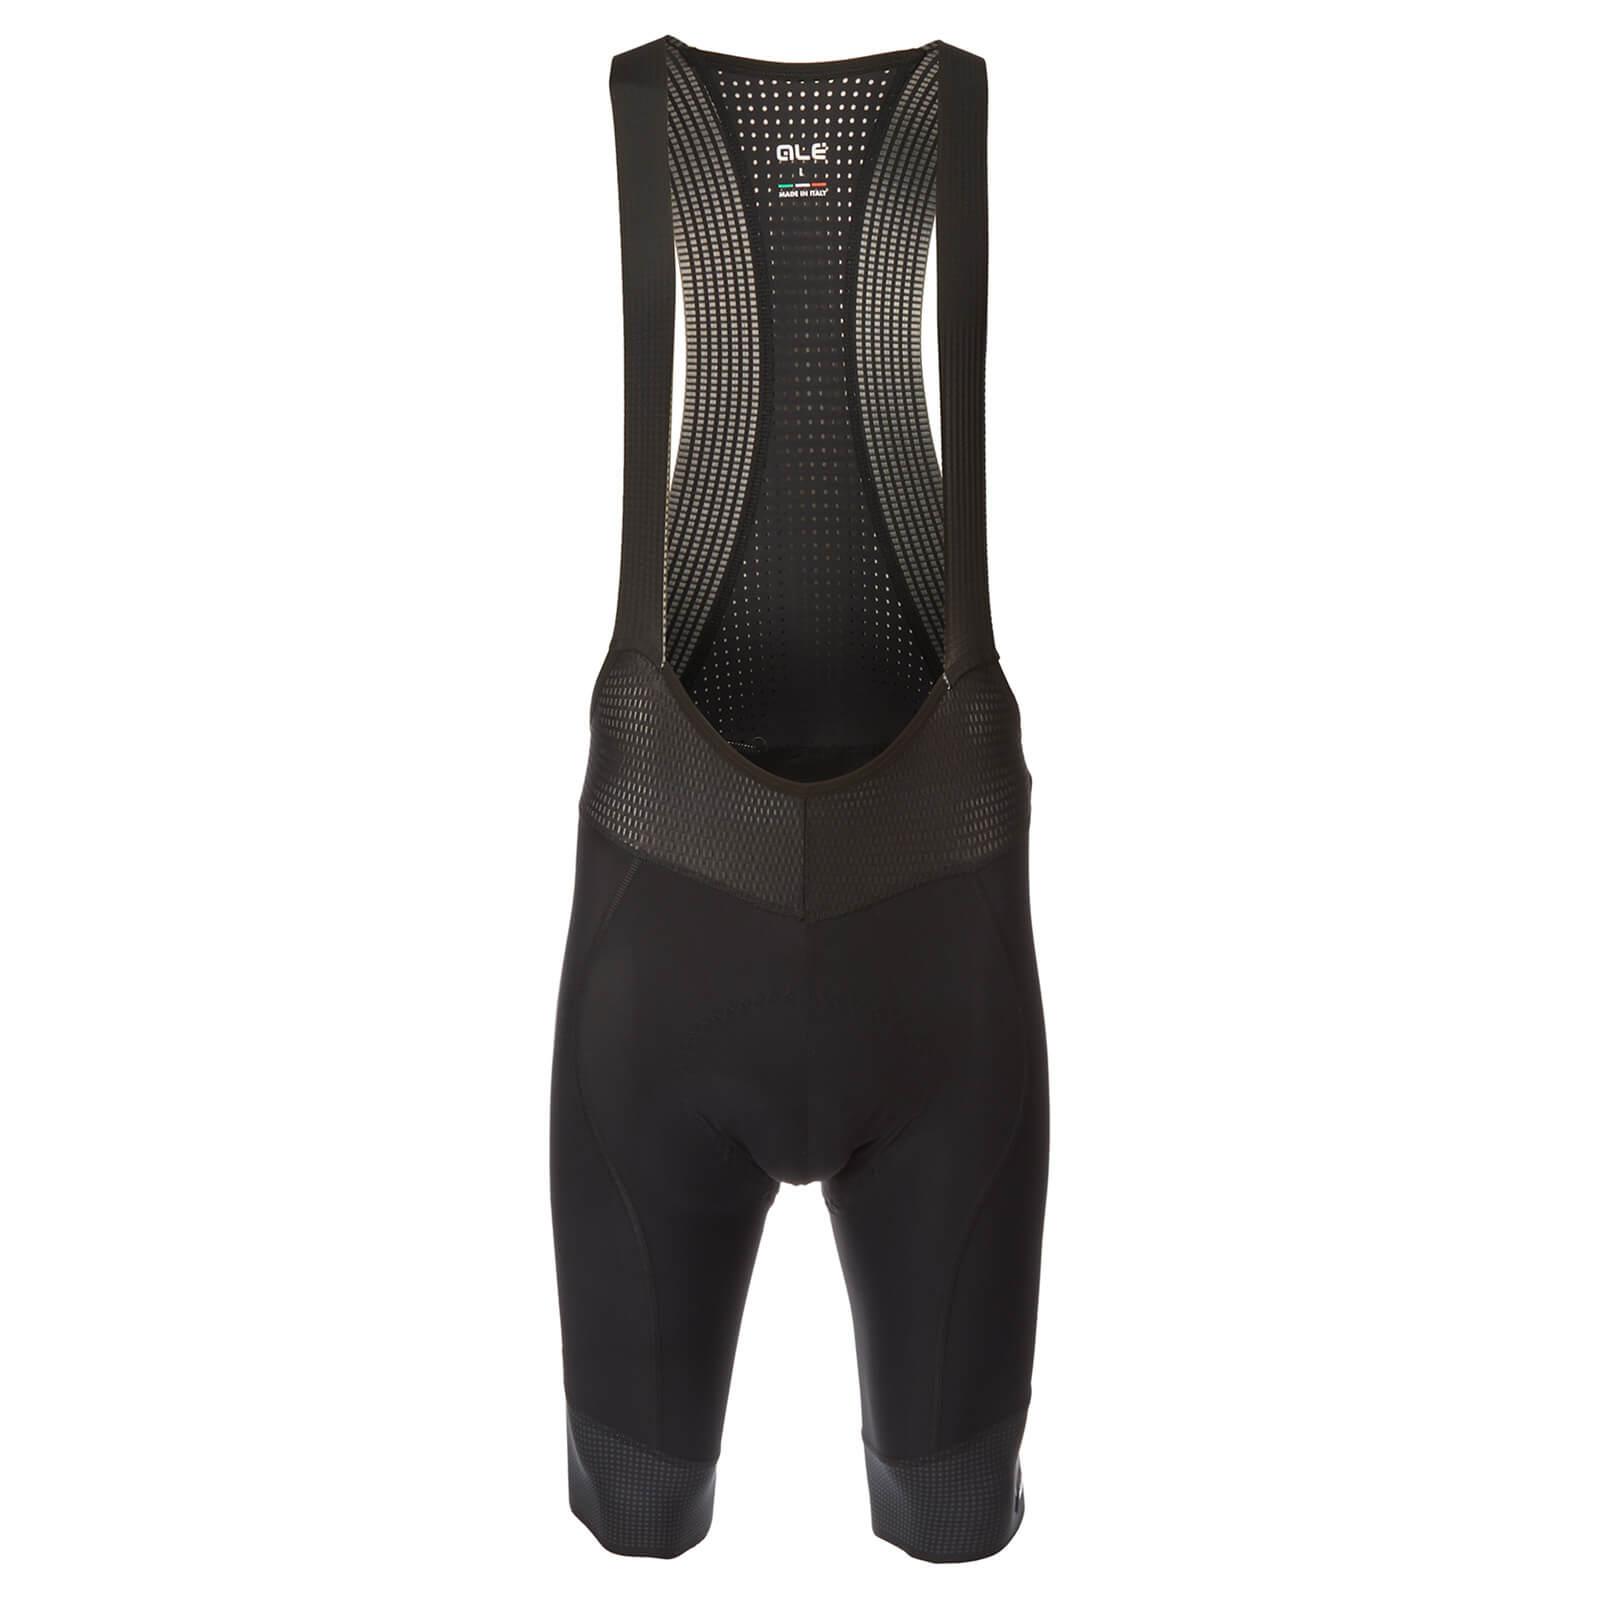 Alé PRS Master Bib Shorts - M - Black/Charcoal